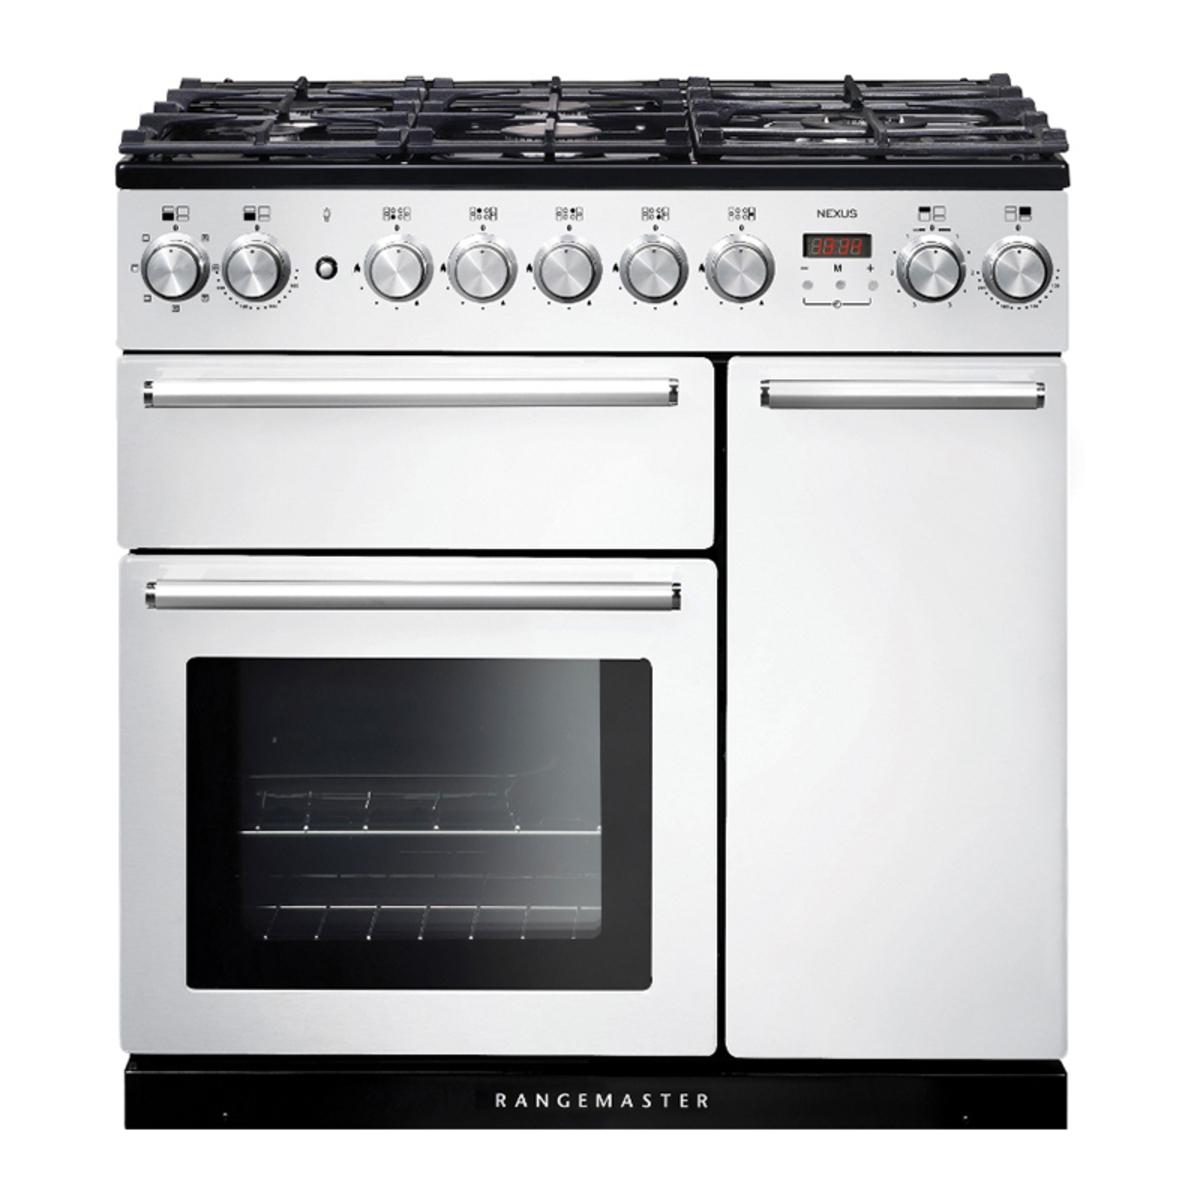 Rangemaster NEX90DFFWHC (106140) 90cm Dual Fuel Range Cooker in White with Chrome Trim